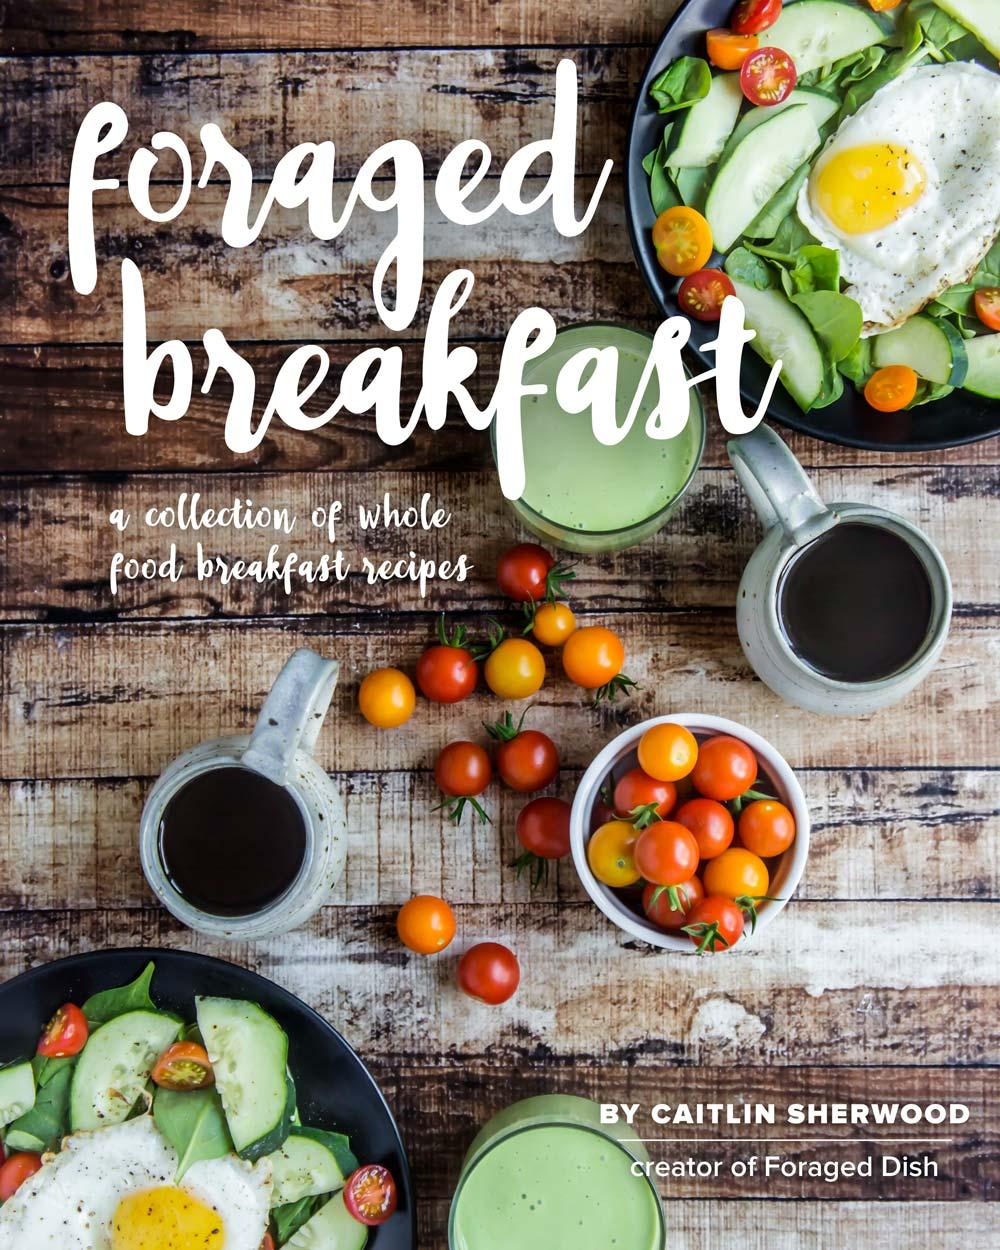 Foraged Breakfast eCookbook